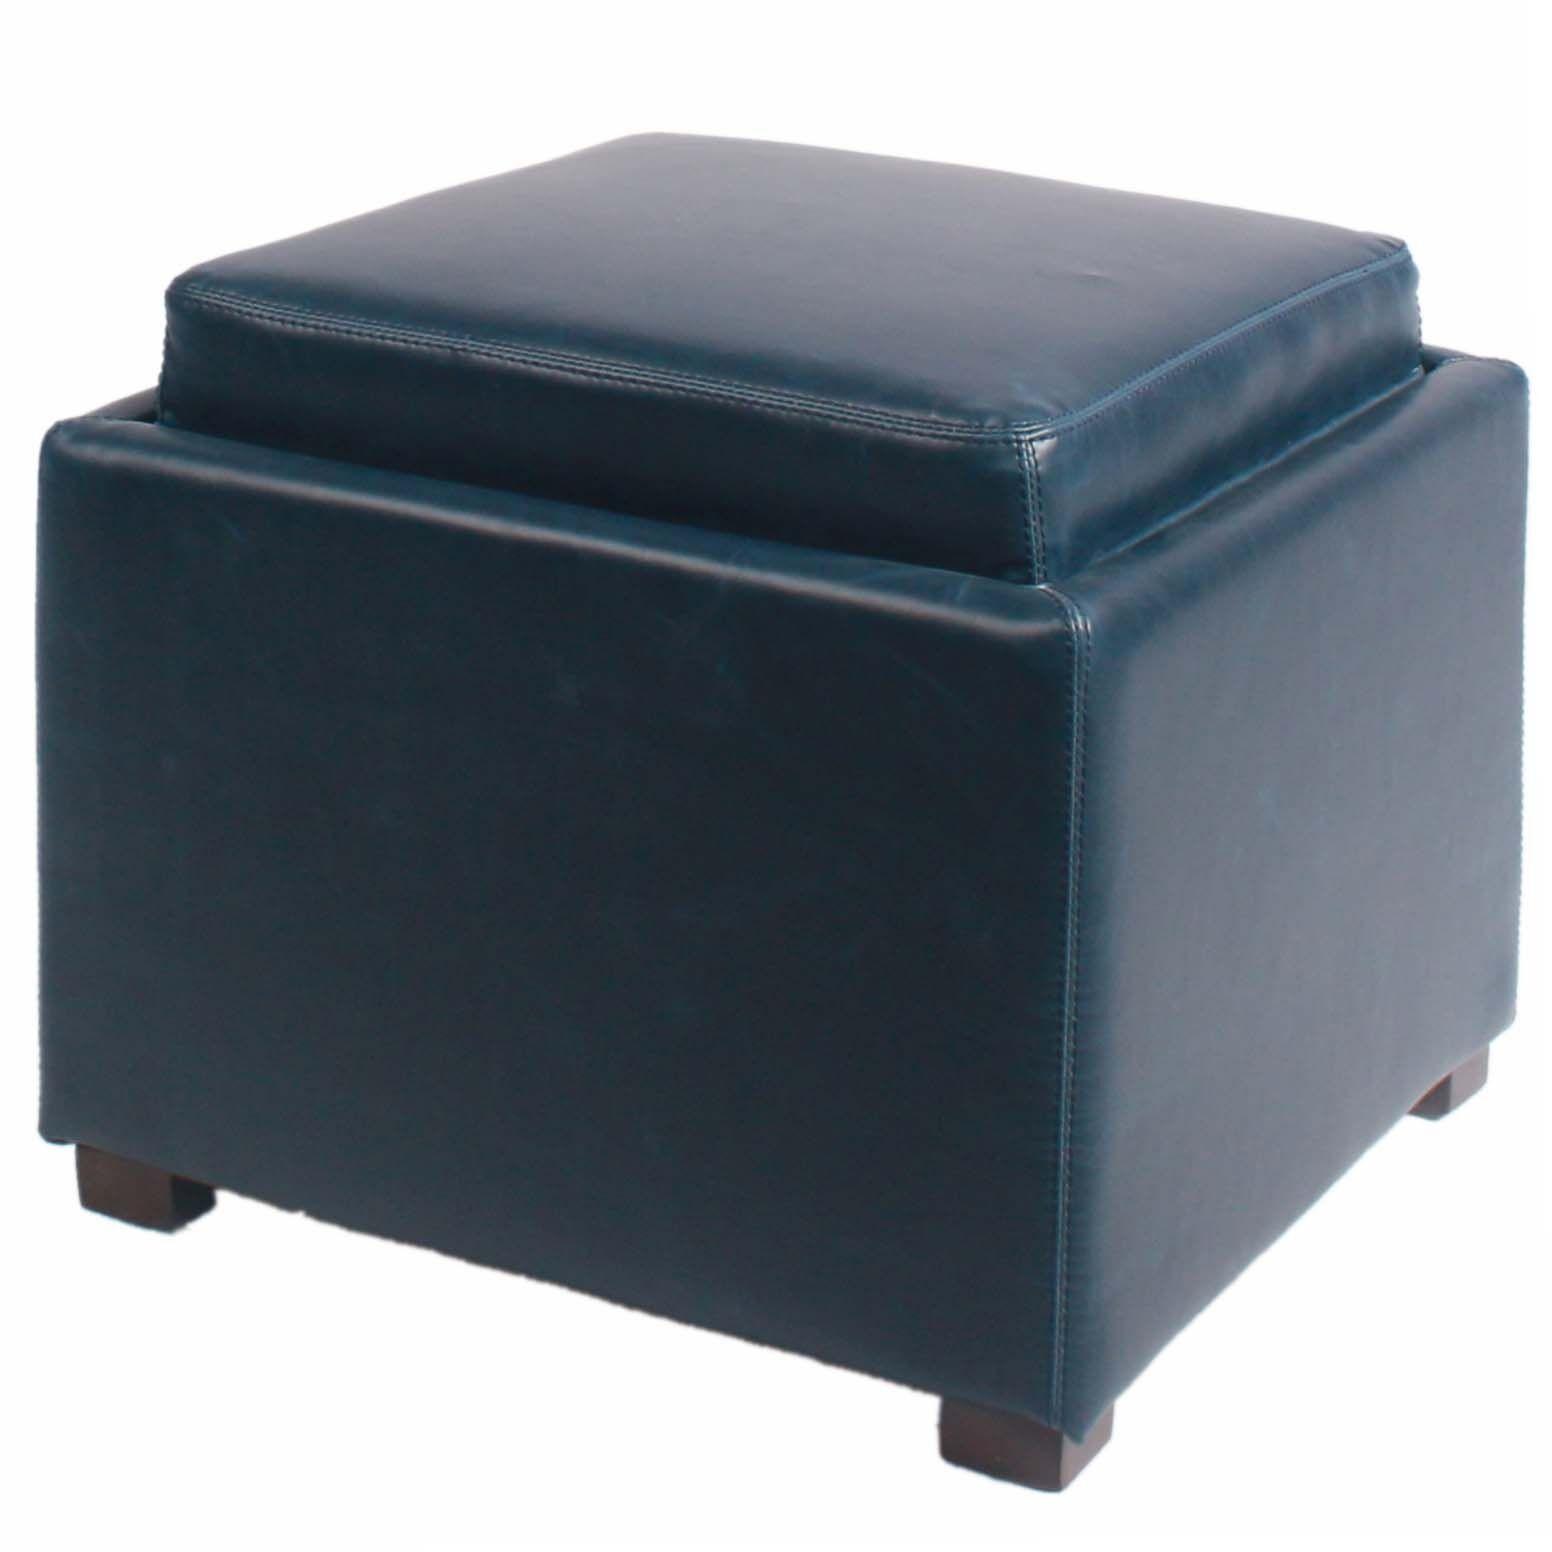 Jeddo Cube Ottoman Leather Color: Vintage Blue